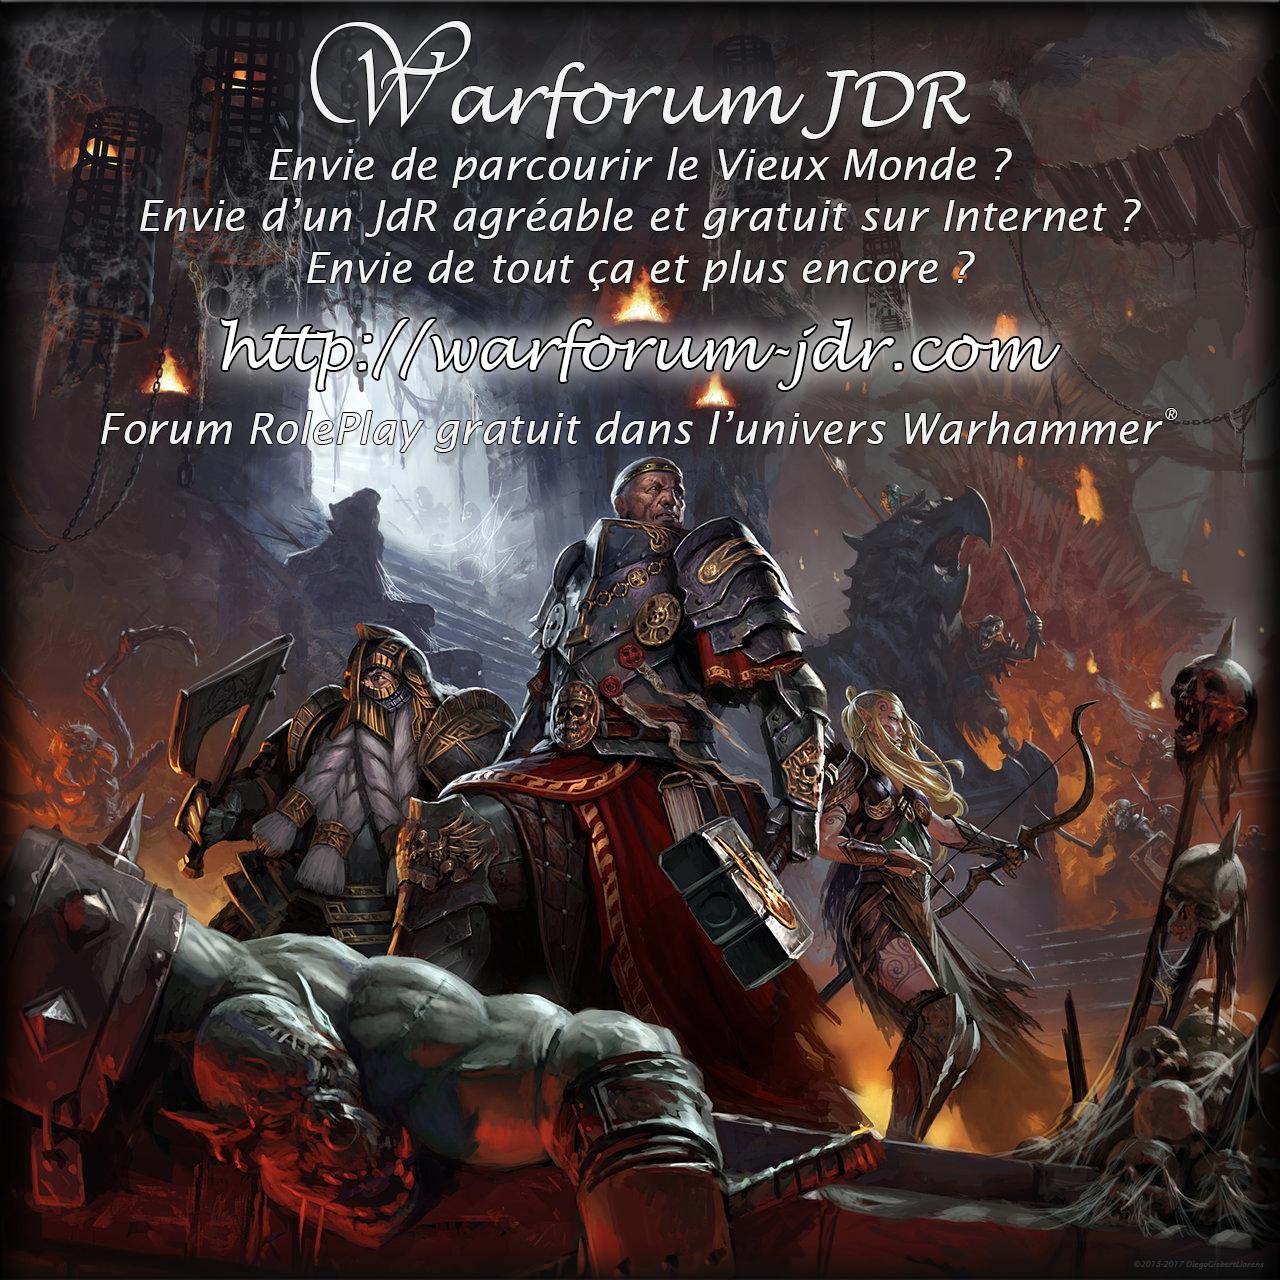 Warforum-JDR 357018tractforum2017